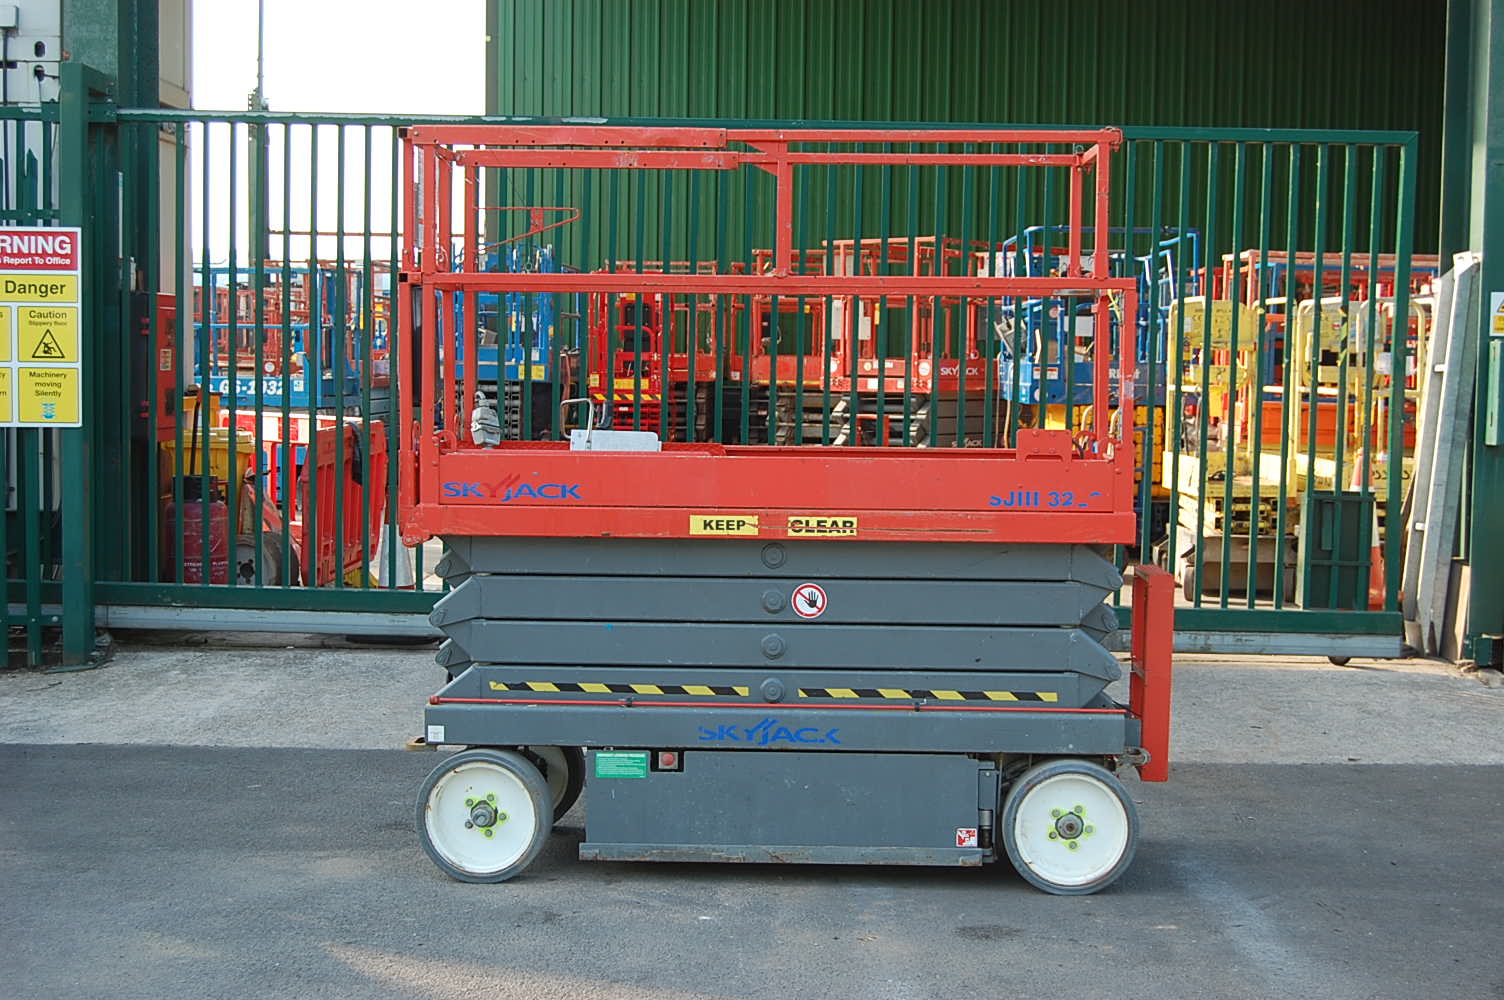 2012 Skyjack 3226 Electric Scissor Lift 9.9m